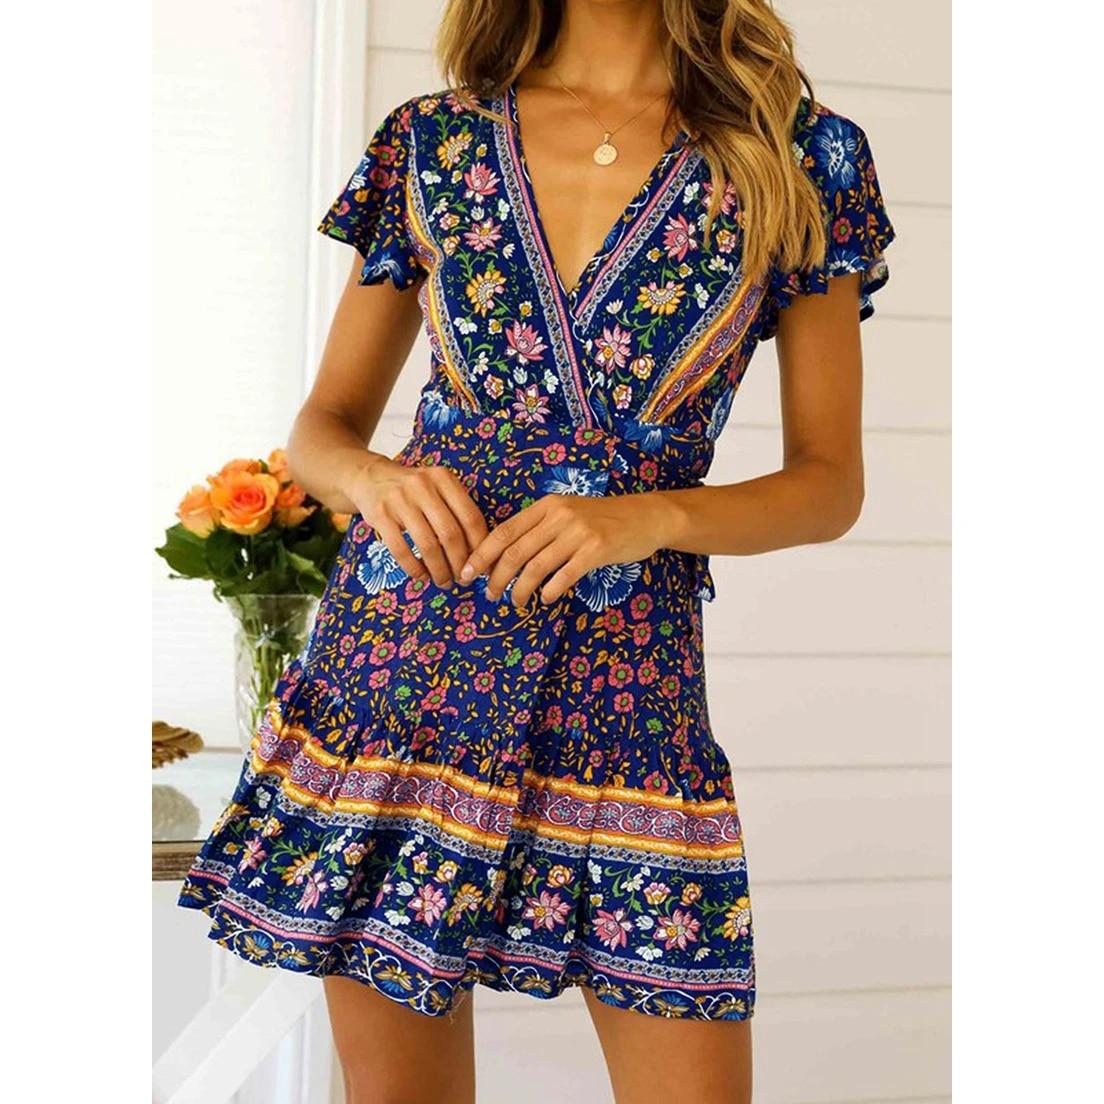 Bohemian Womens Floral Bodycon Dress Ladies Ruffle Summer Holiday Mini A-Line Plus Size Dress